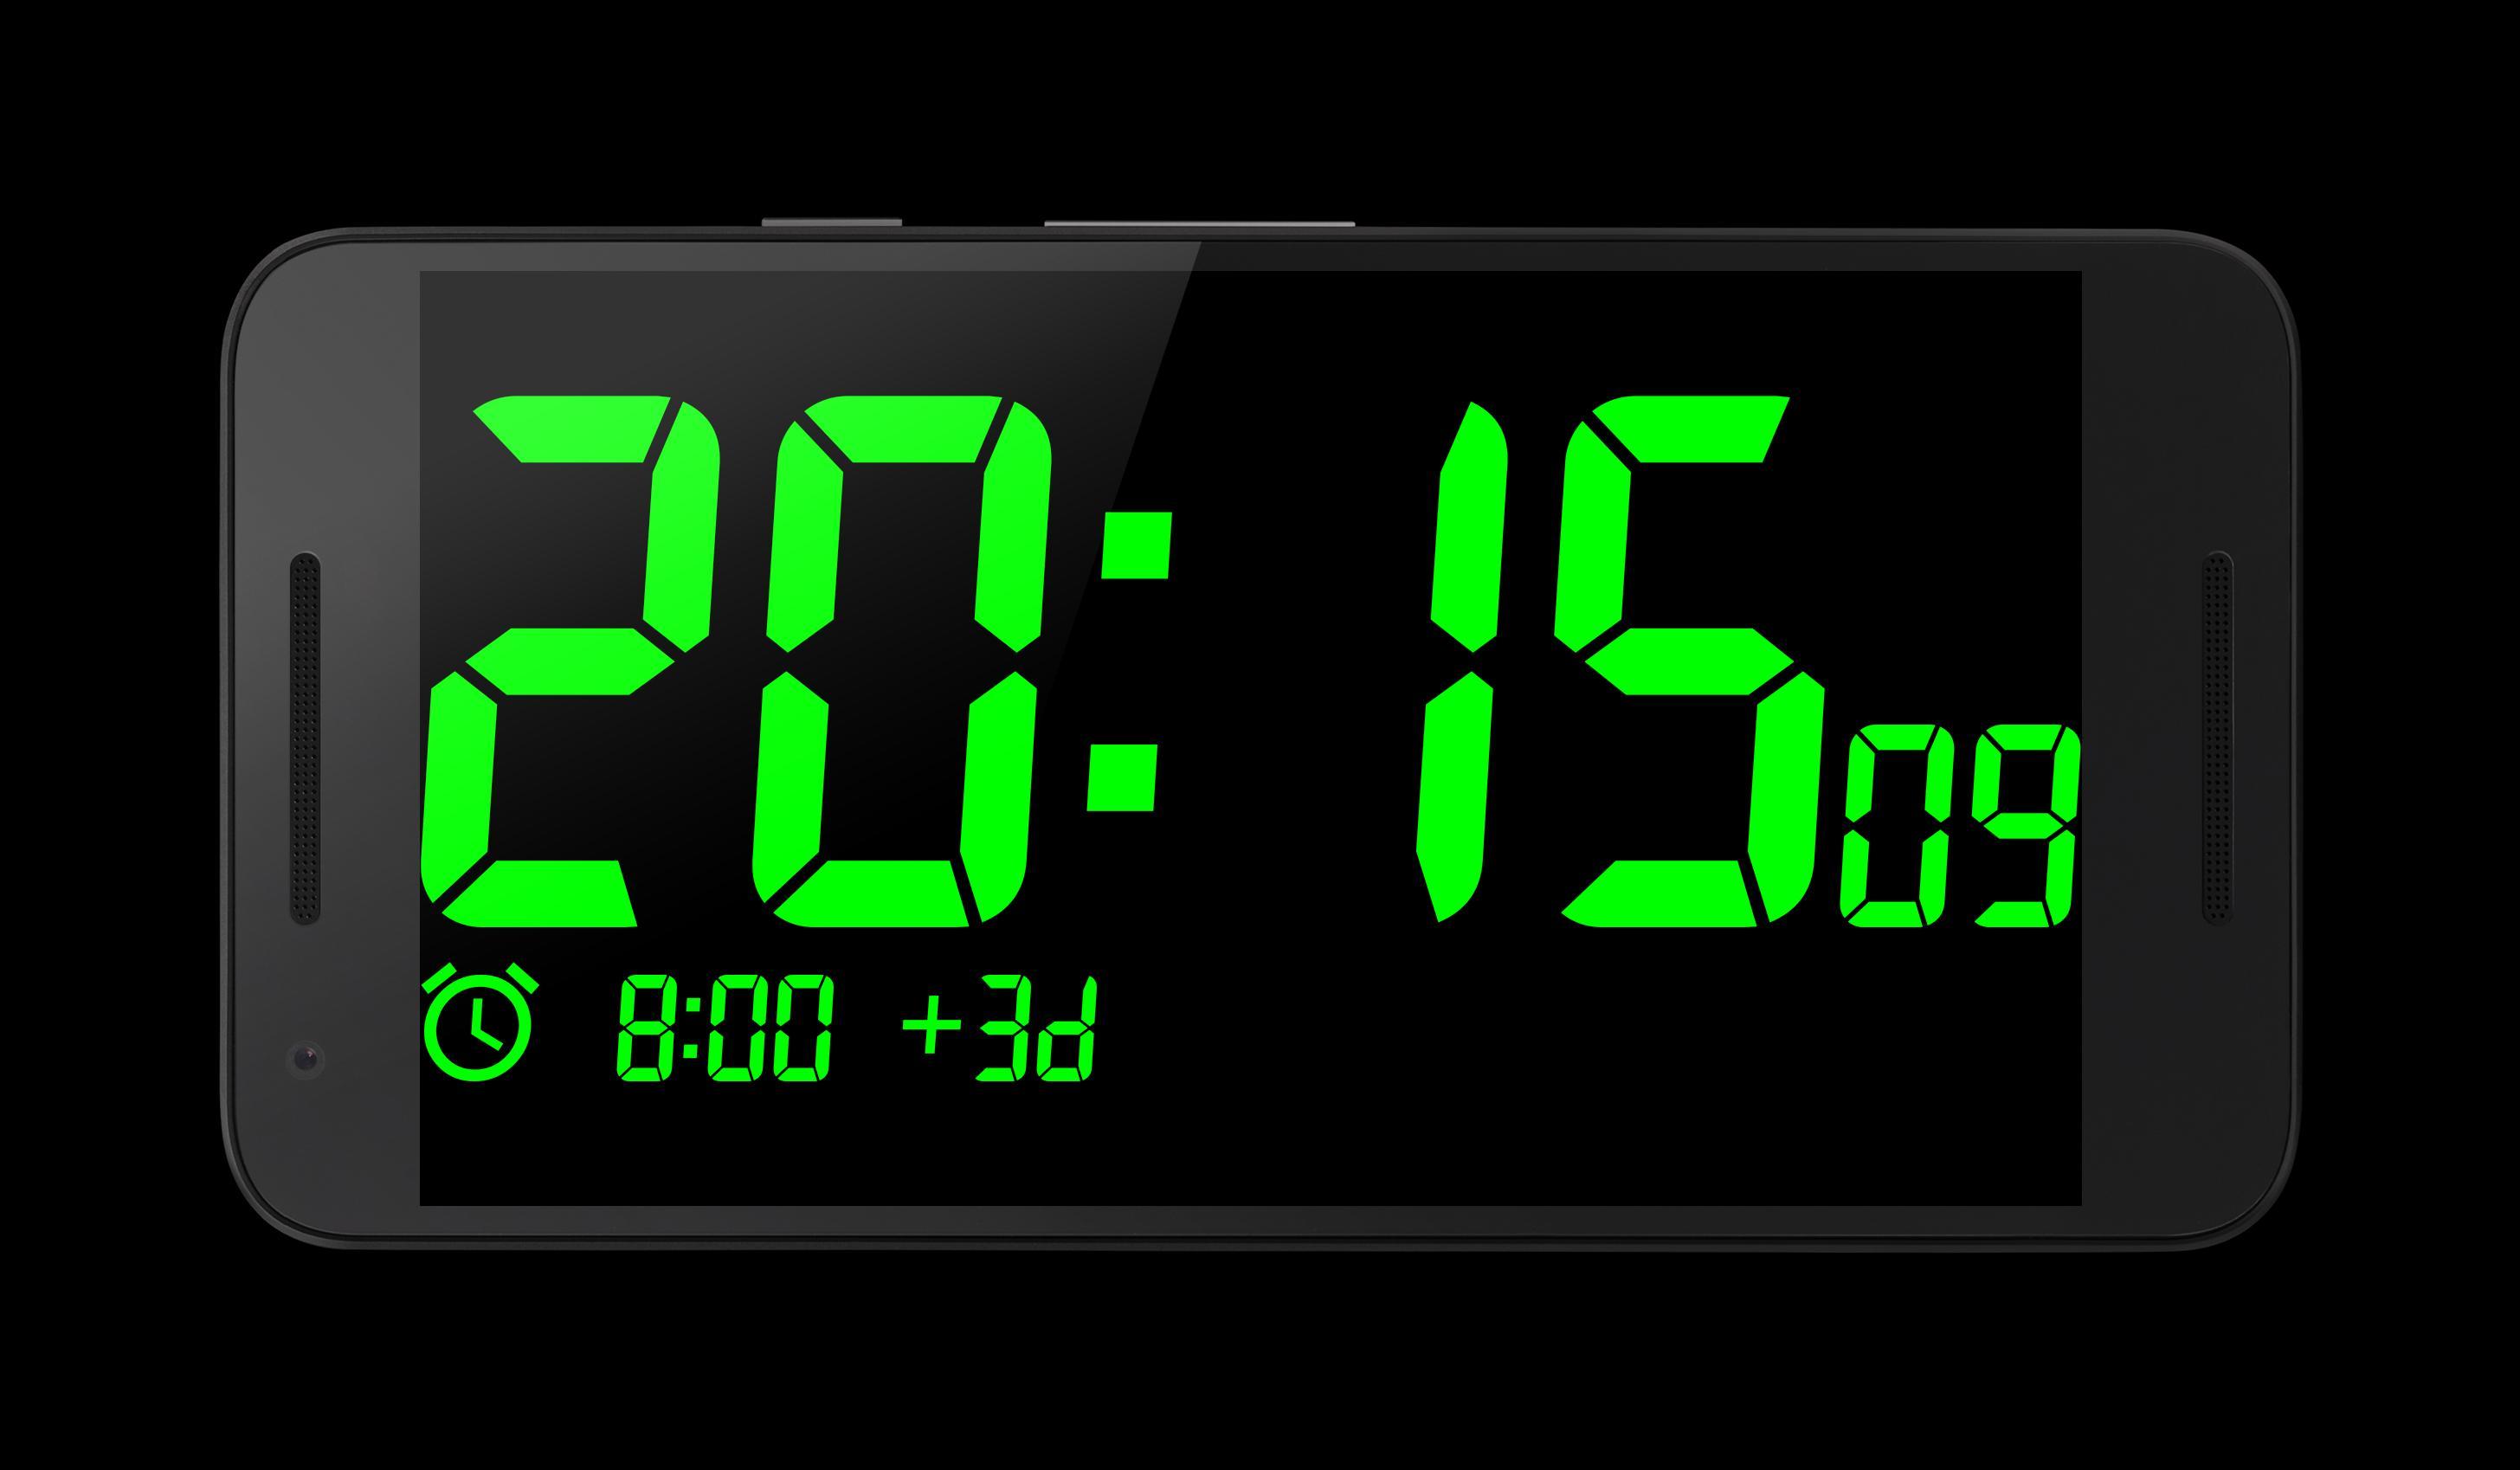 Big Digital Clock for Android - APK Download